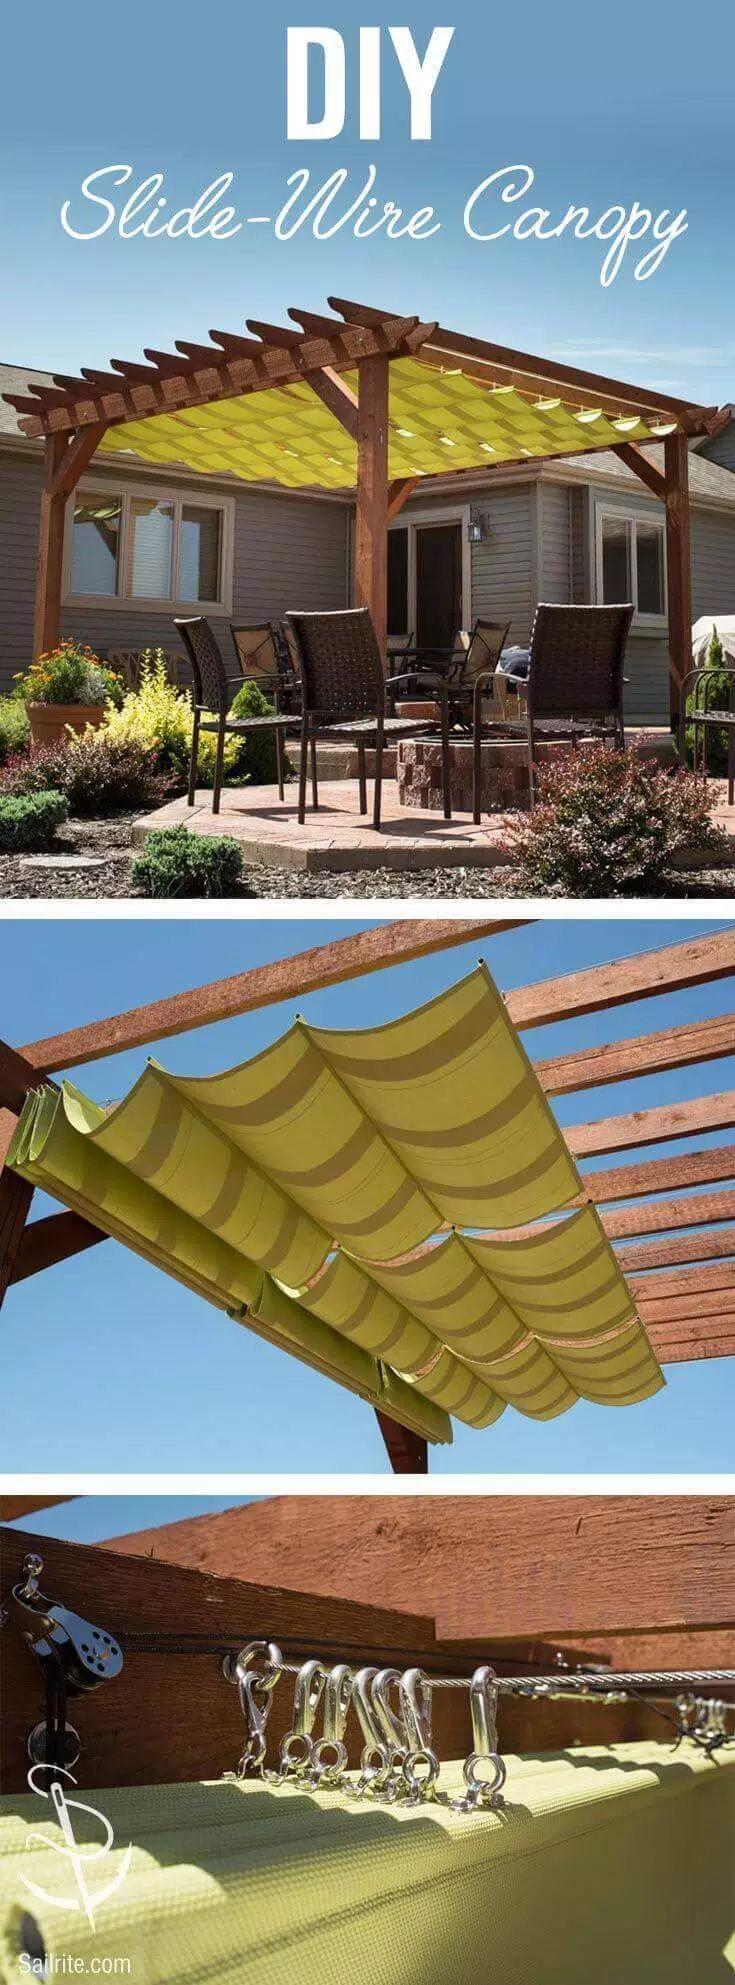 36 Diy Pergola Ideas With Low Budget For Your Garden Farmfoodfamily Pergola Backyard Pergola Backyard Shade